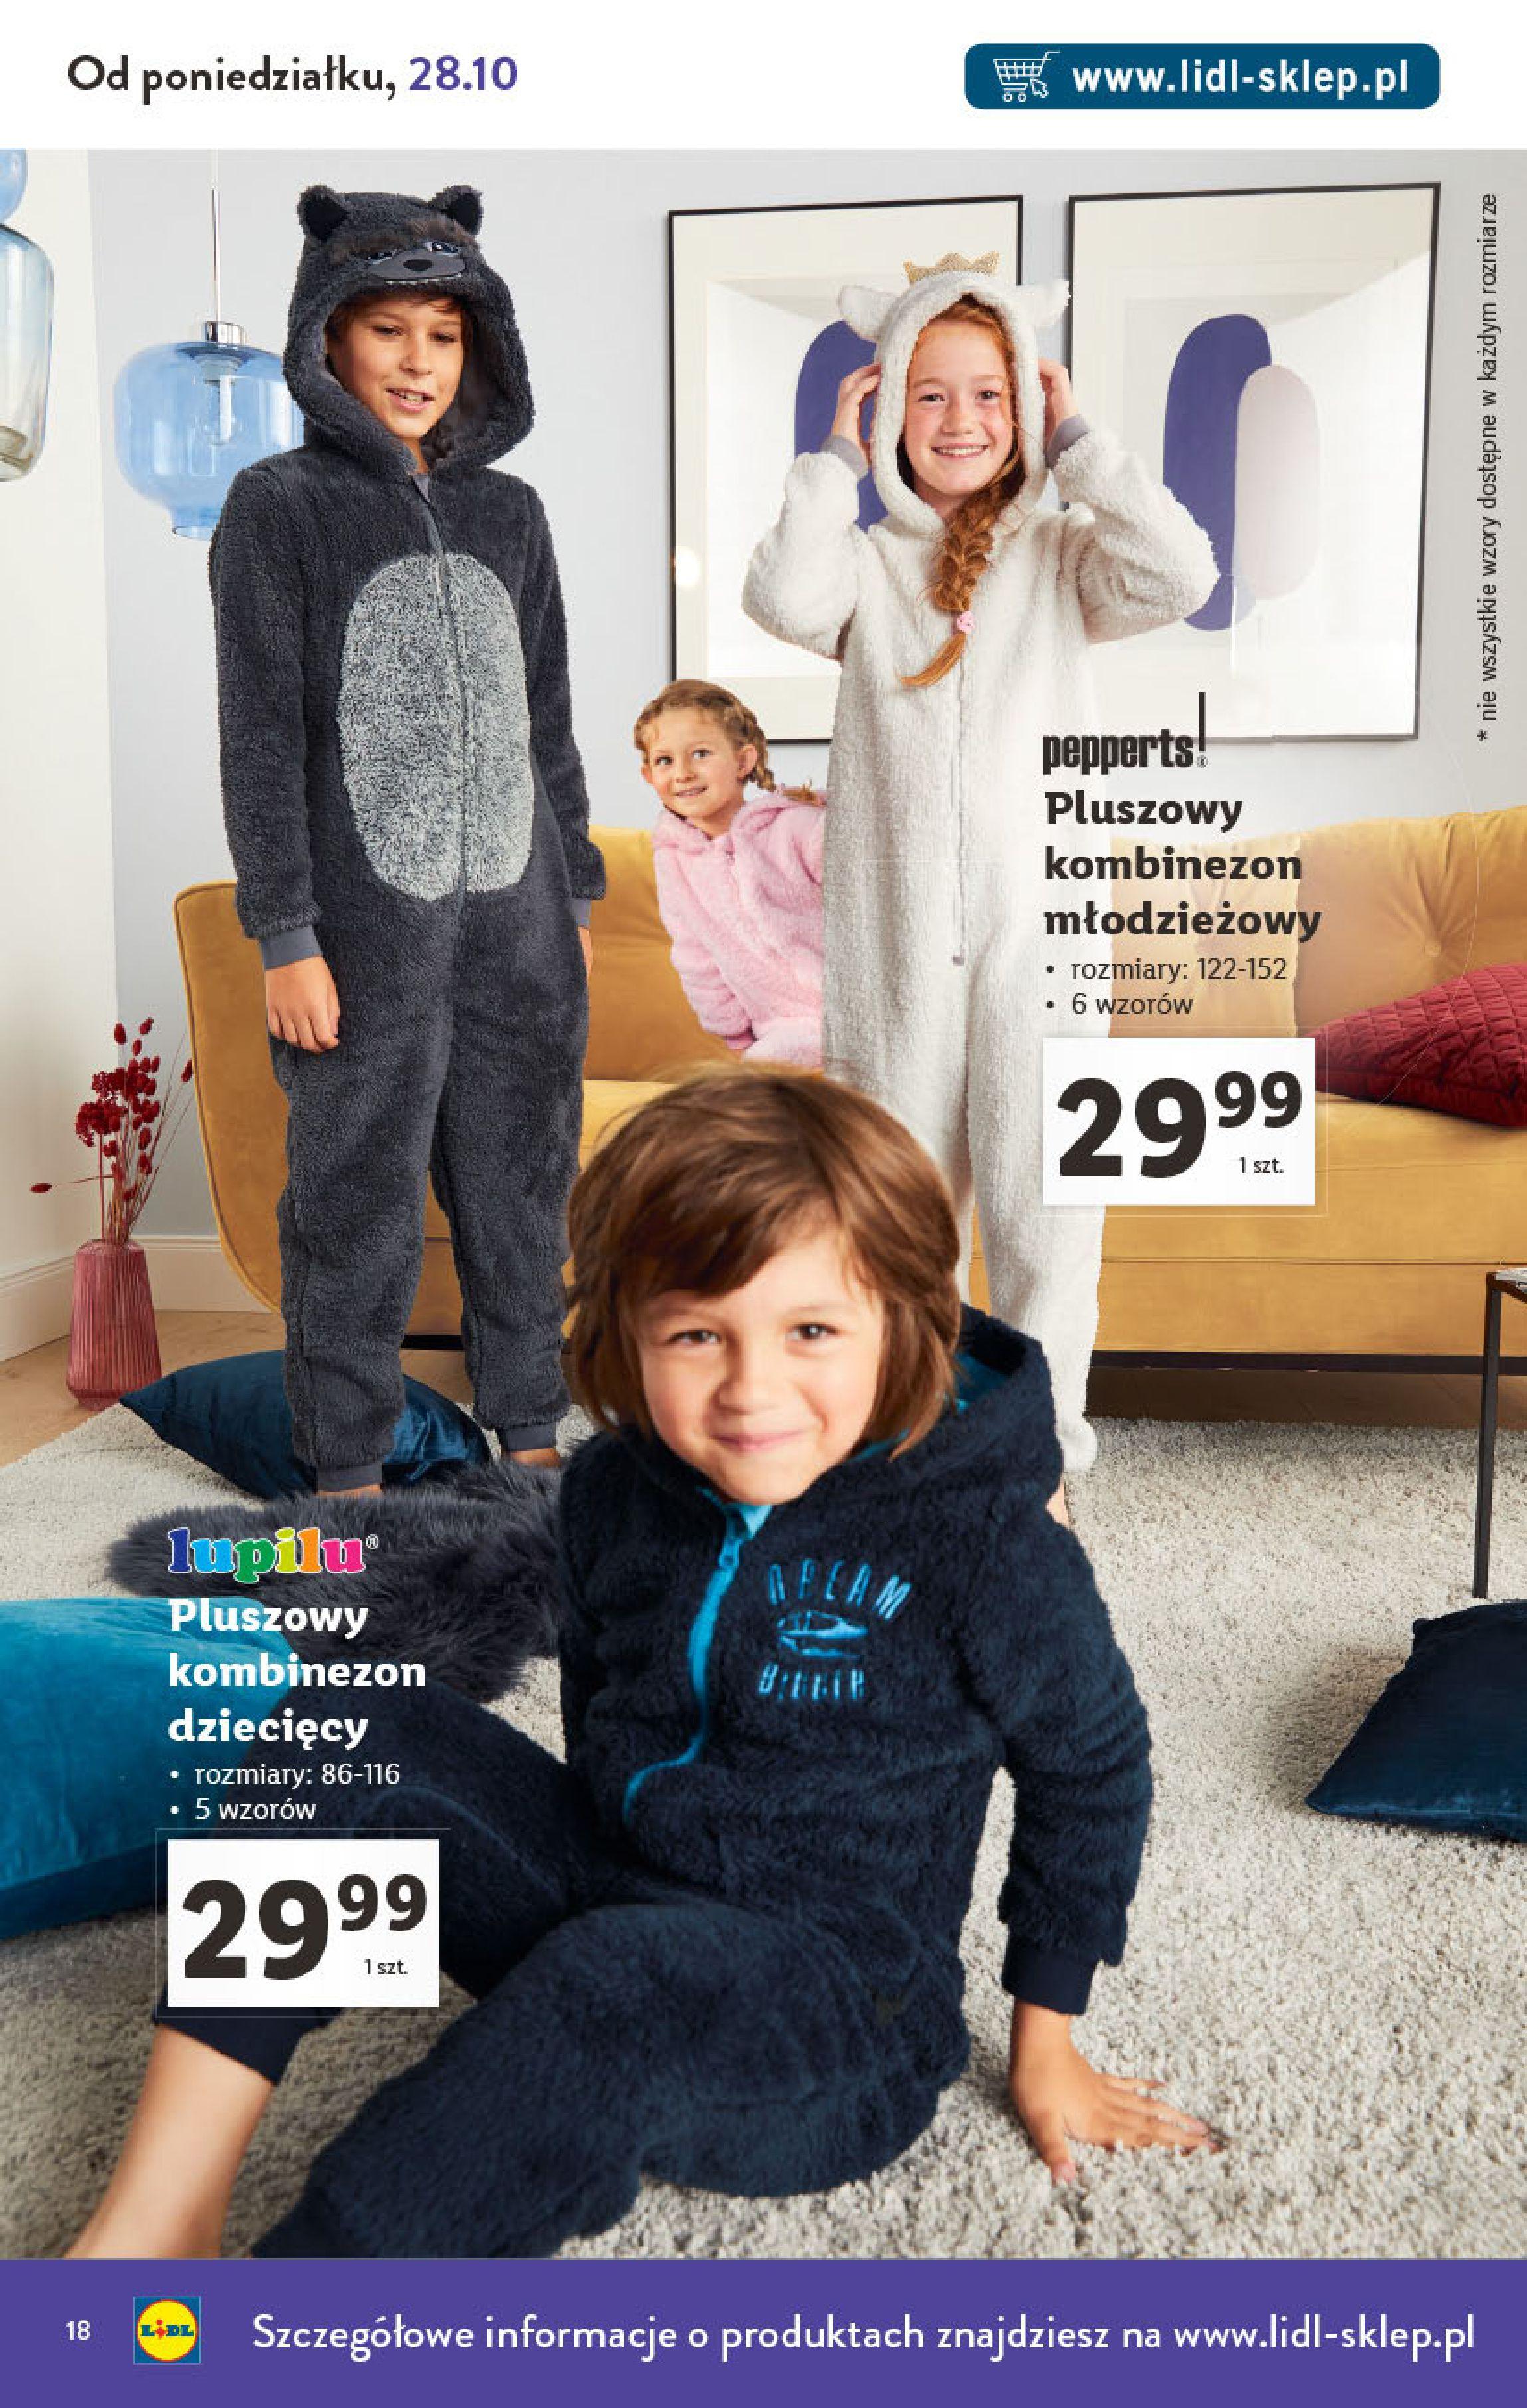 Gazetka Lidl - Katalog Online-13.10.2019-02.12.2019-page-18